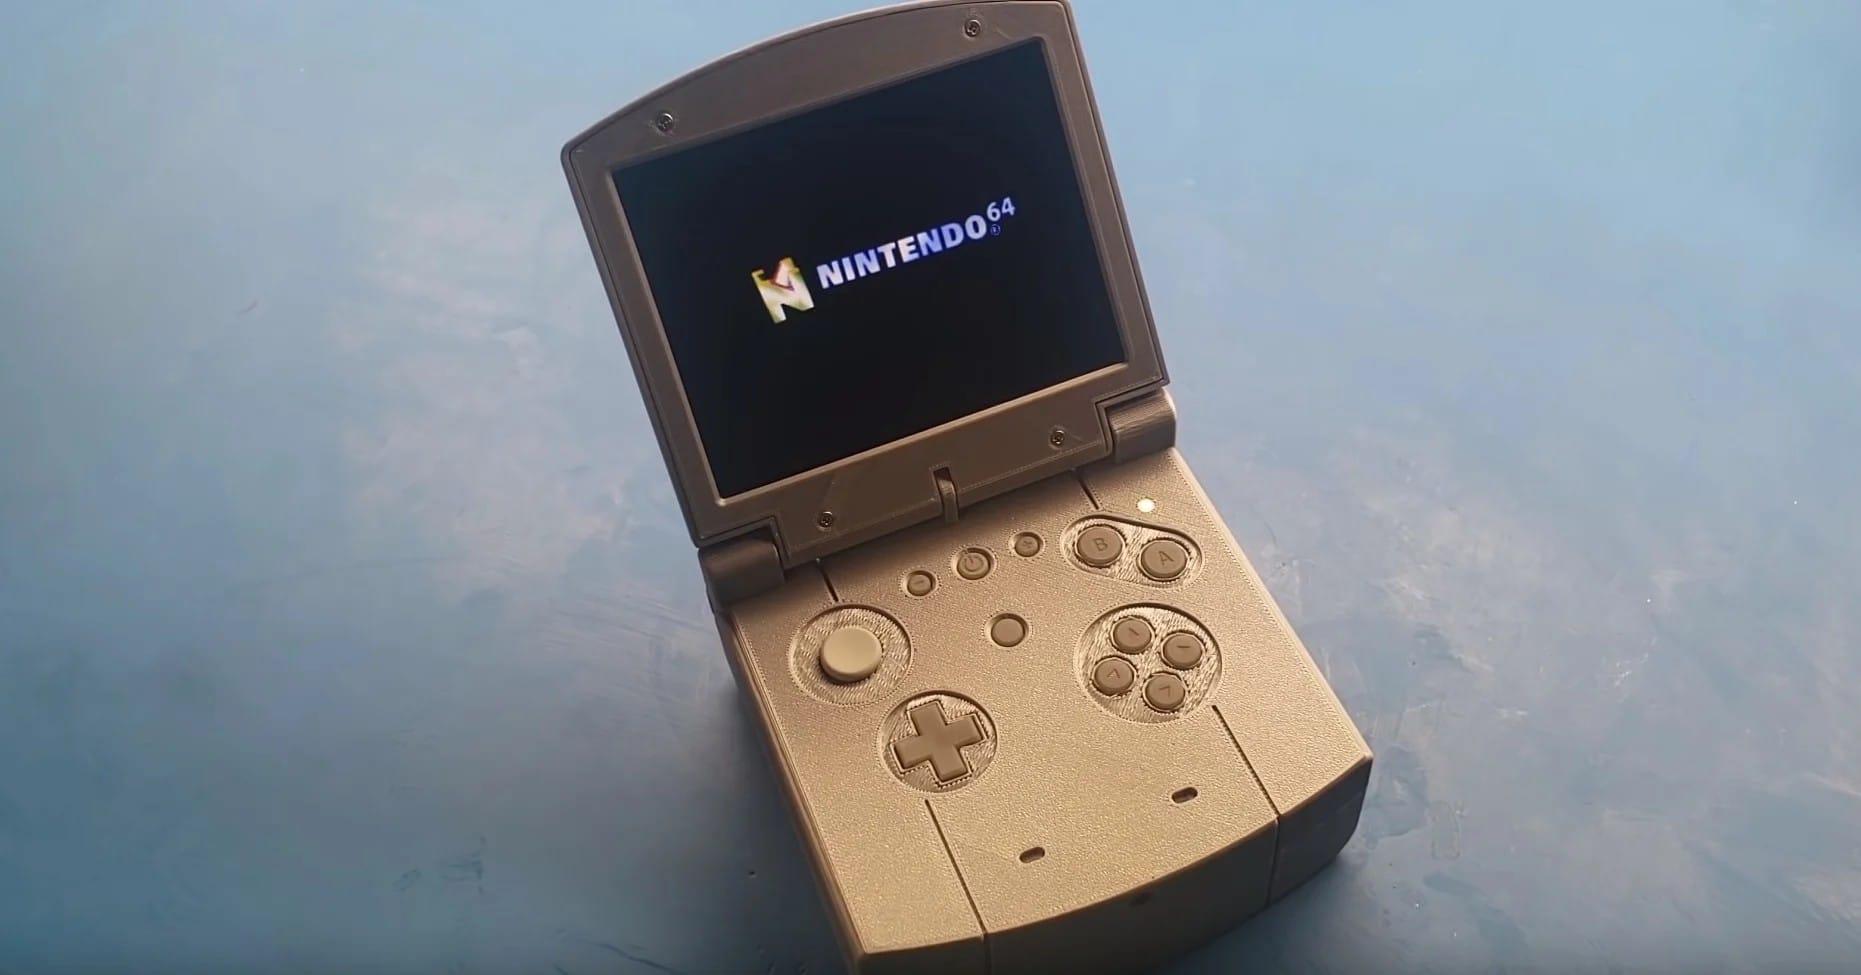 N64 SP: Nintendo 64 Mini als Handheld-Konsole